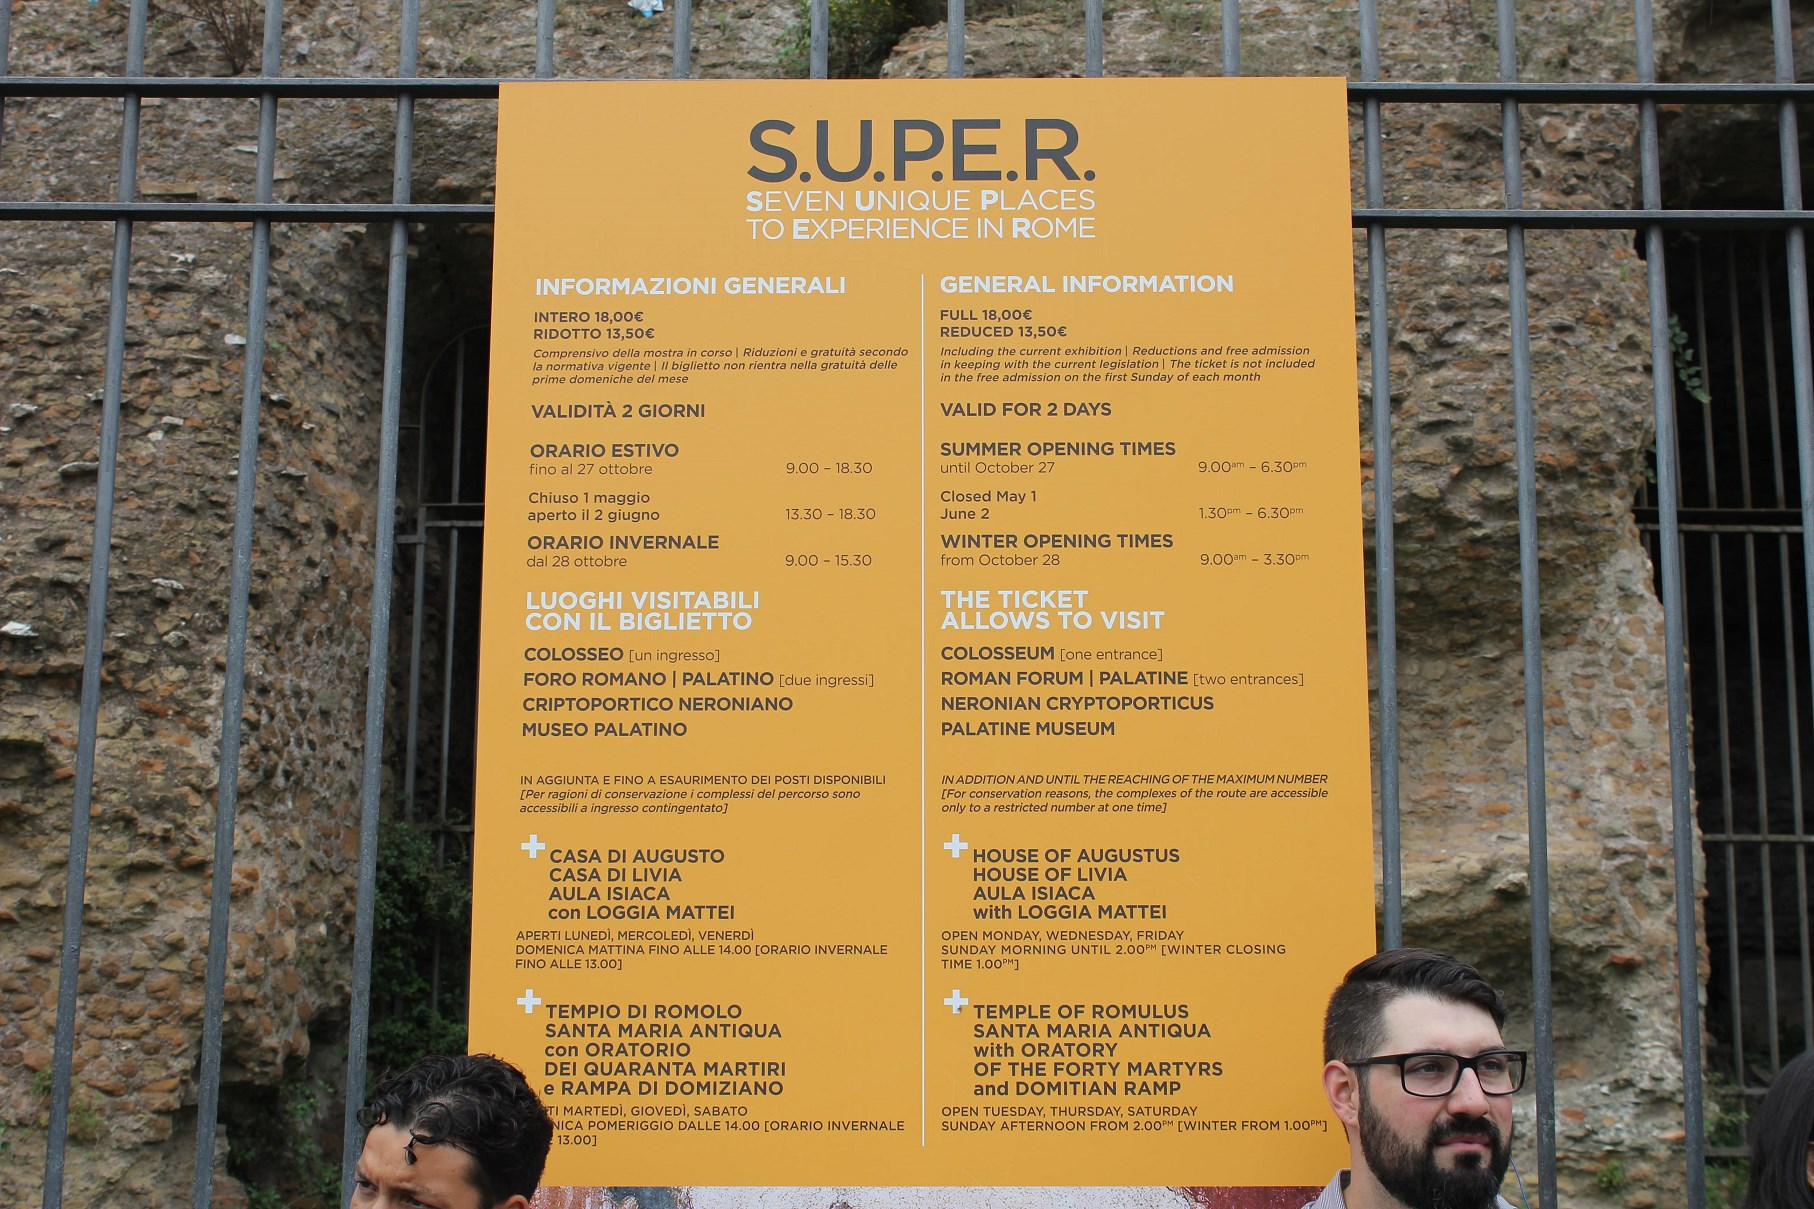 why visiting Colosseum S.U.P.E.R tickets